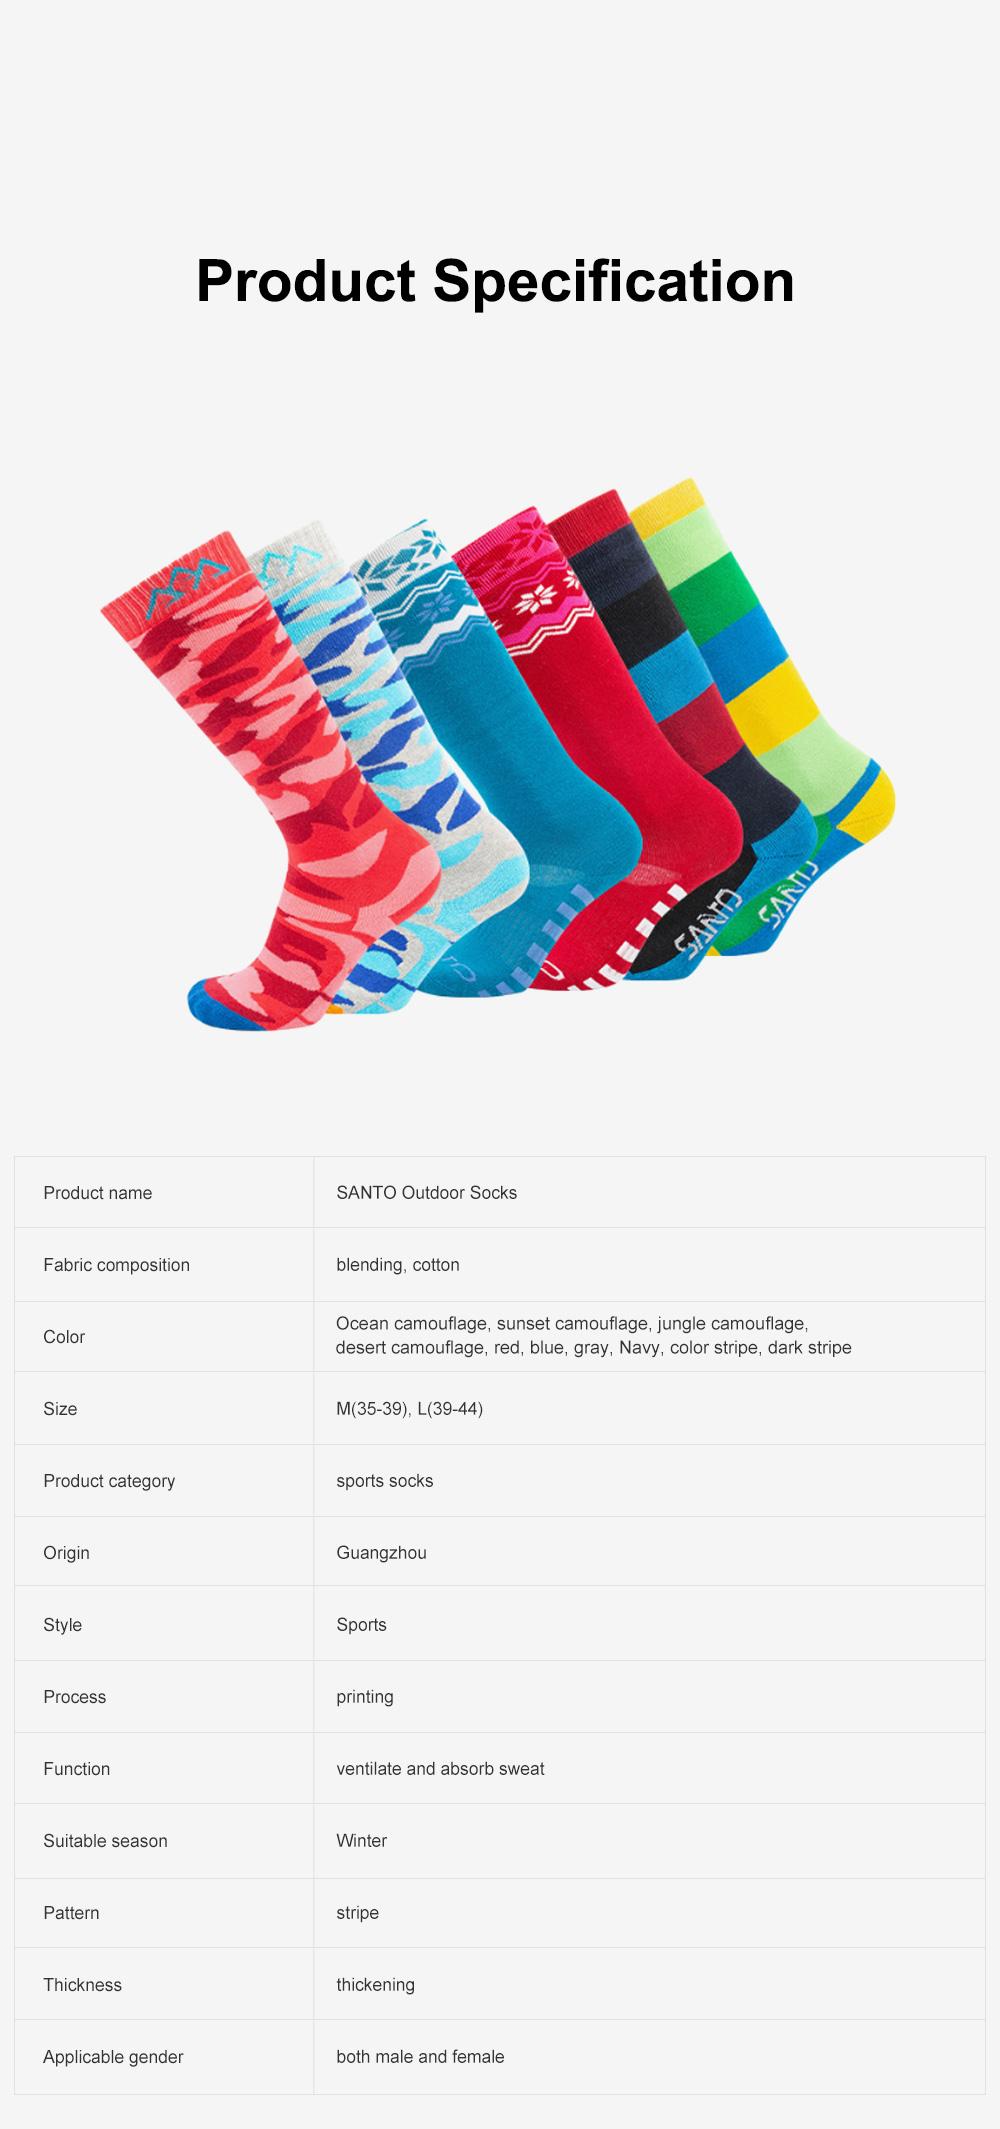 SANTO Outdoor Socks Winter Warm Ski Socks Sports Socks Sweat Absorbing Thickening Socks Long Hiking Socks 6